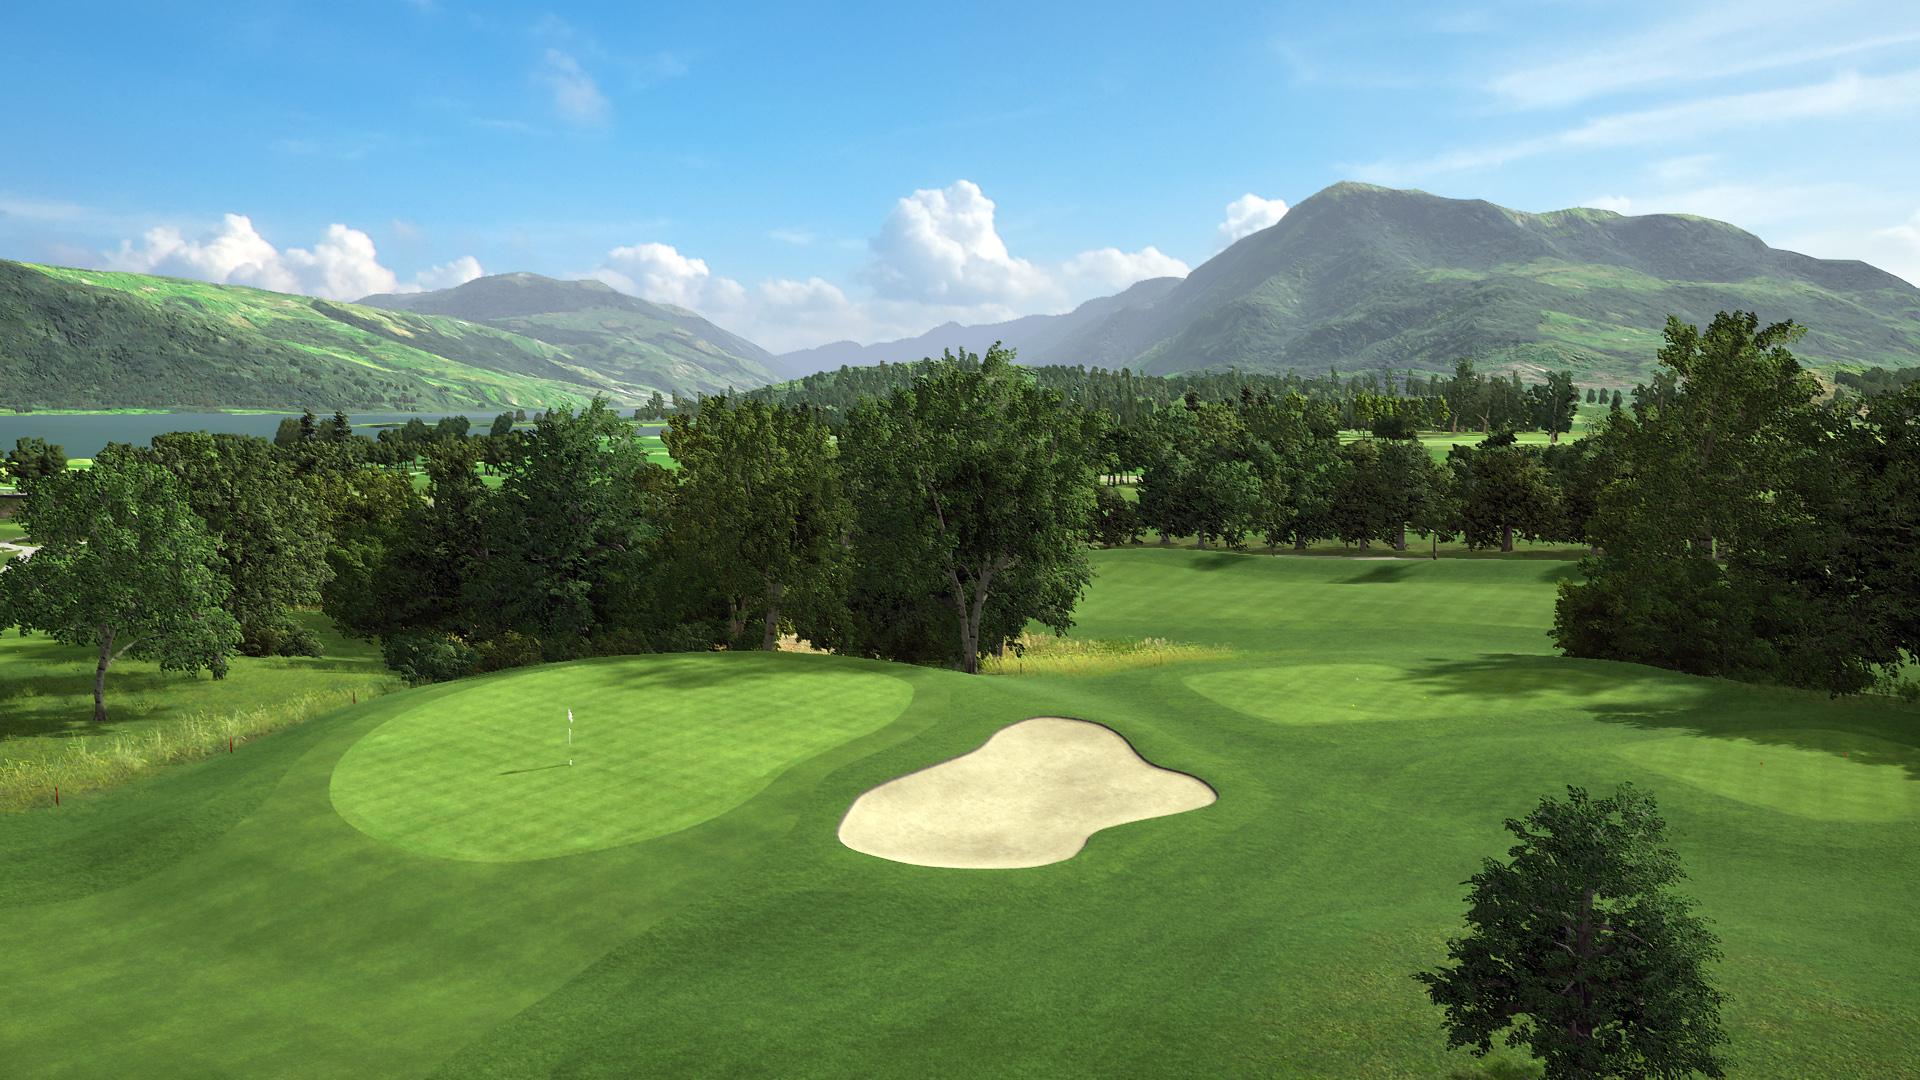 Holzhäusern Golf Park